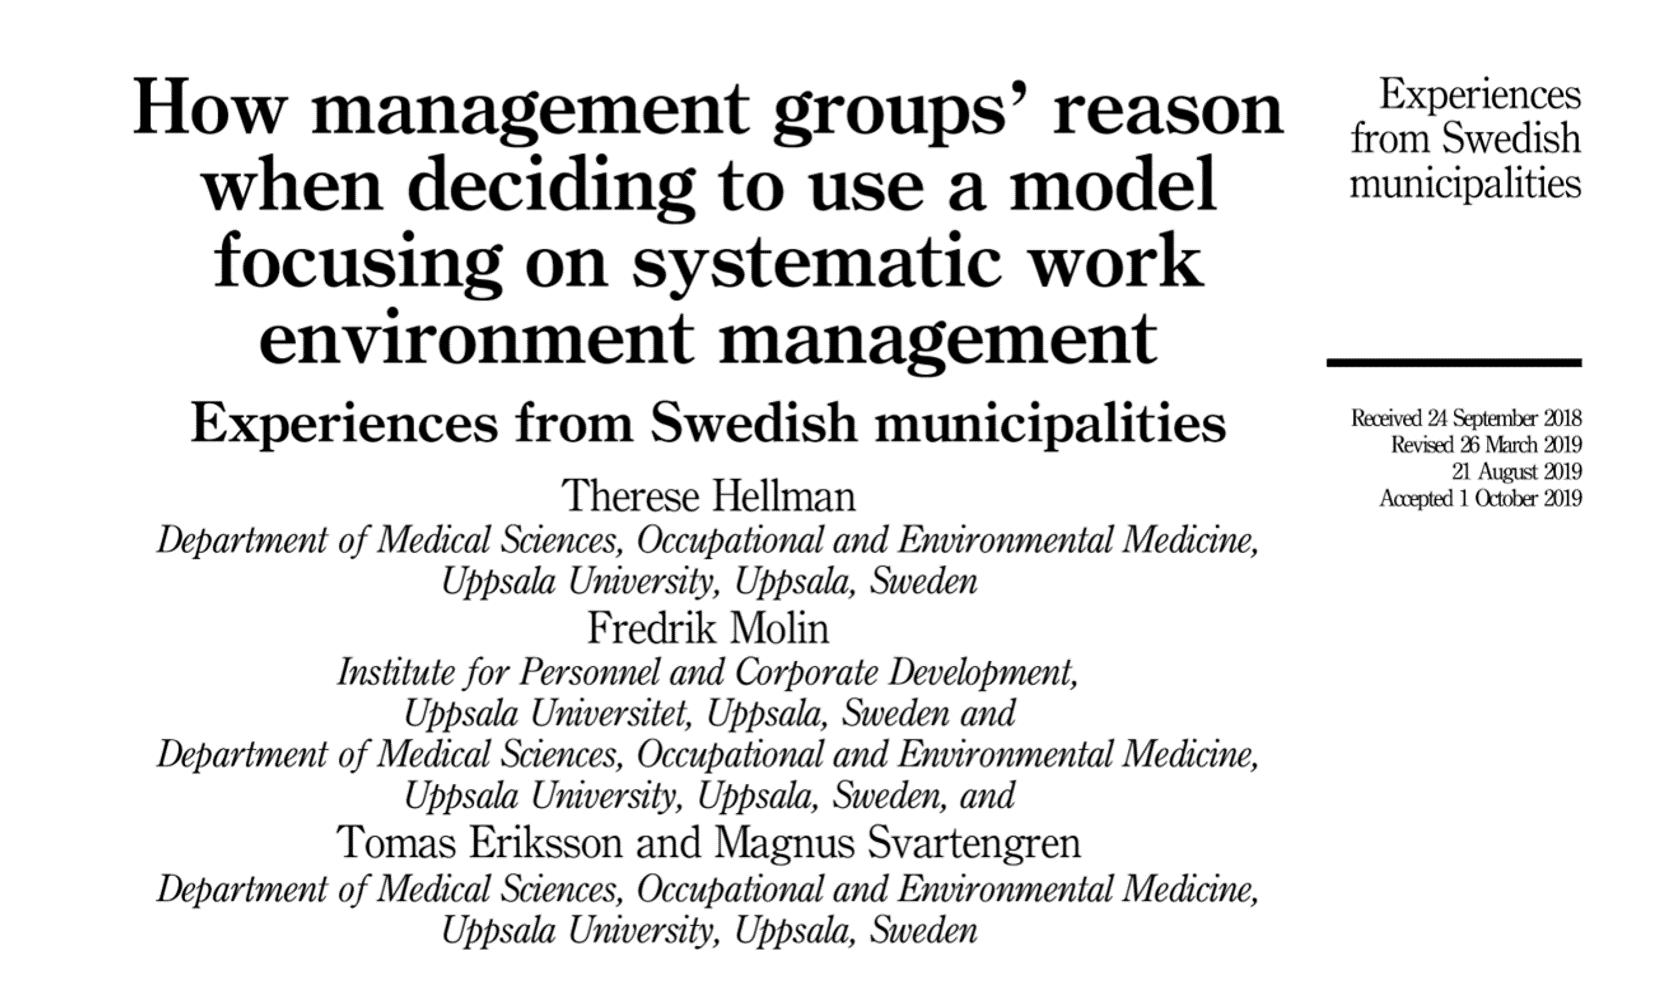 Fredrik Artikel How Managent Groups reason